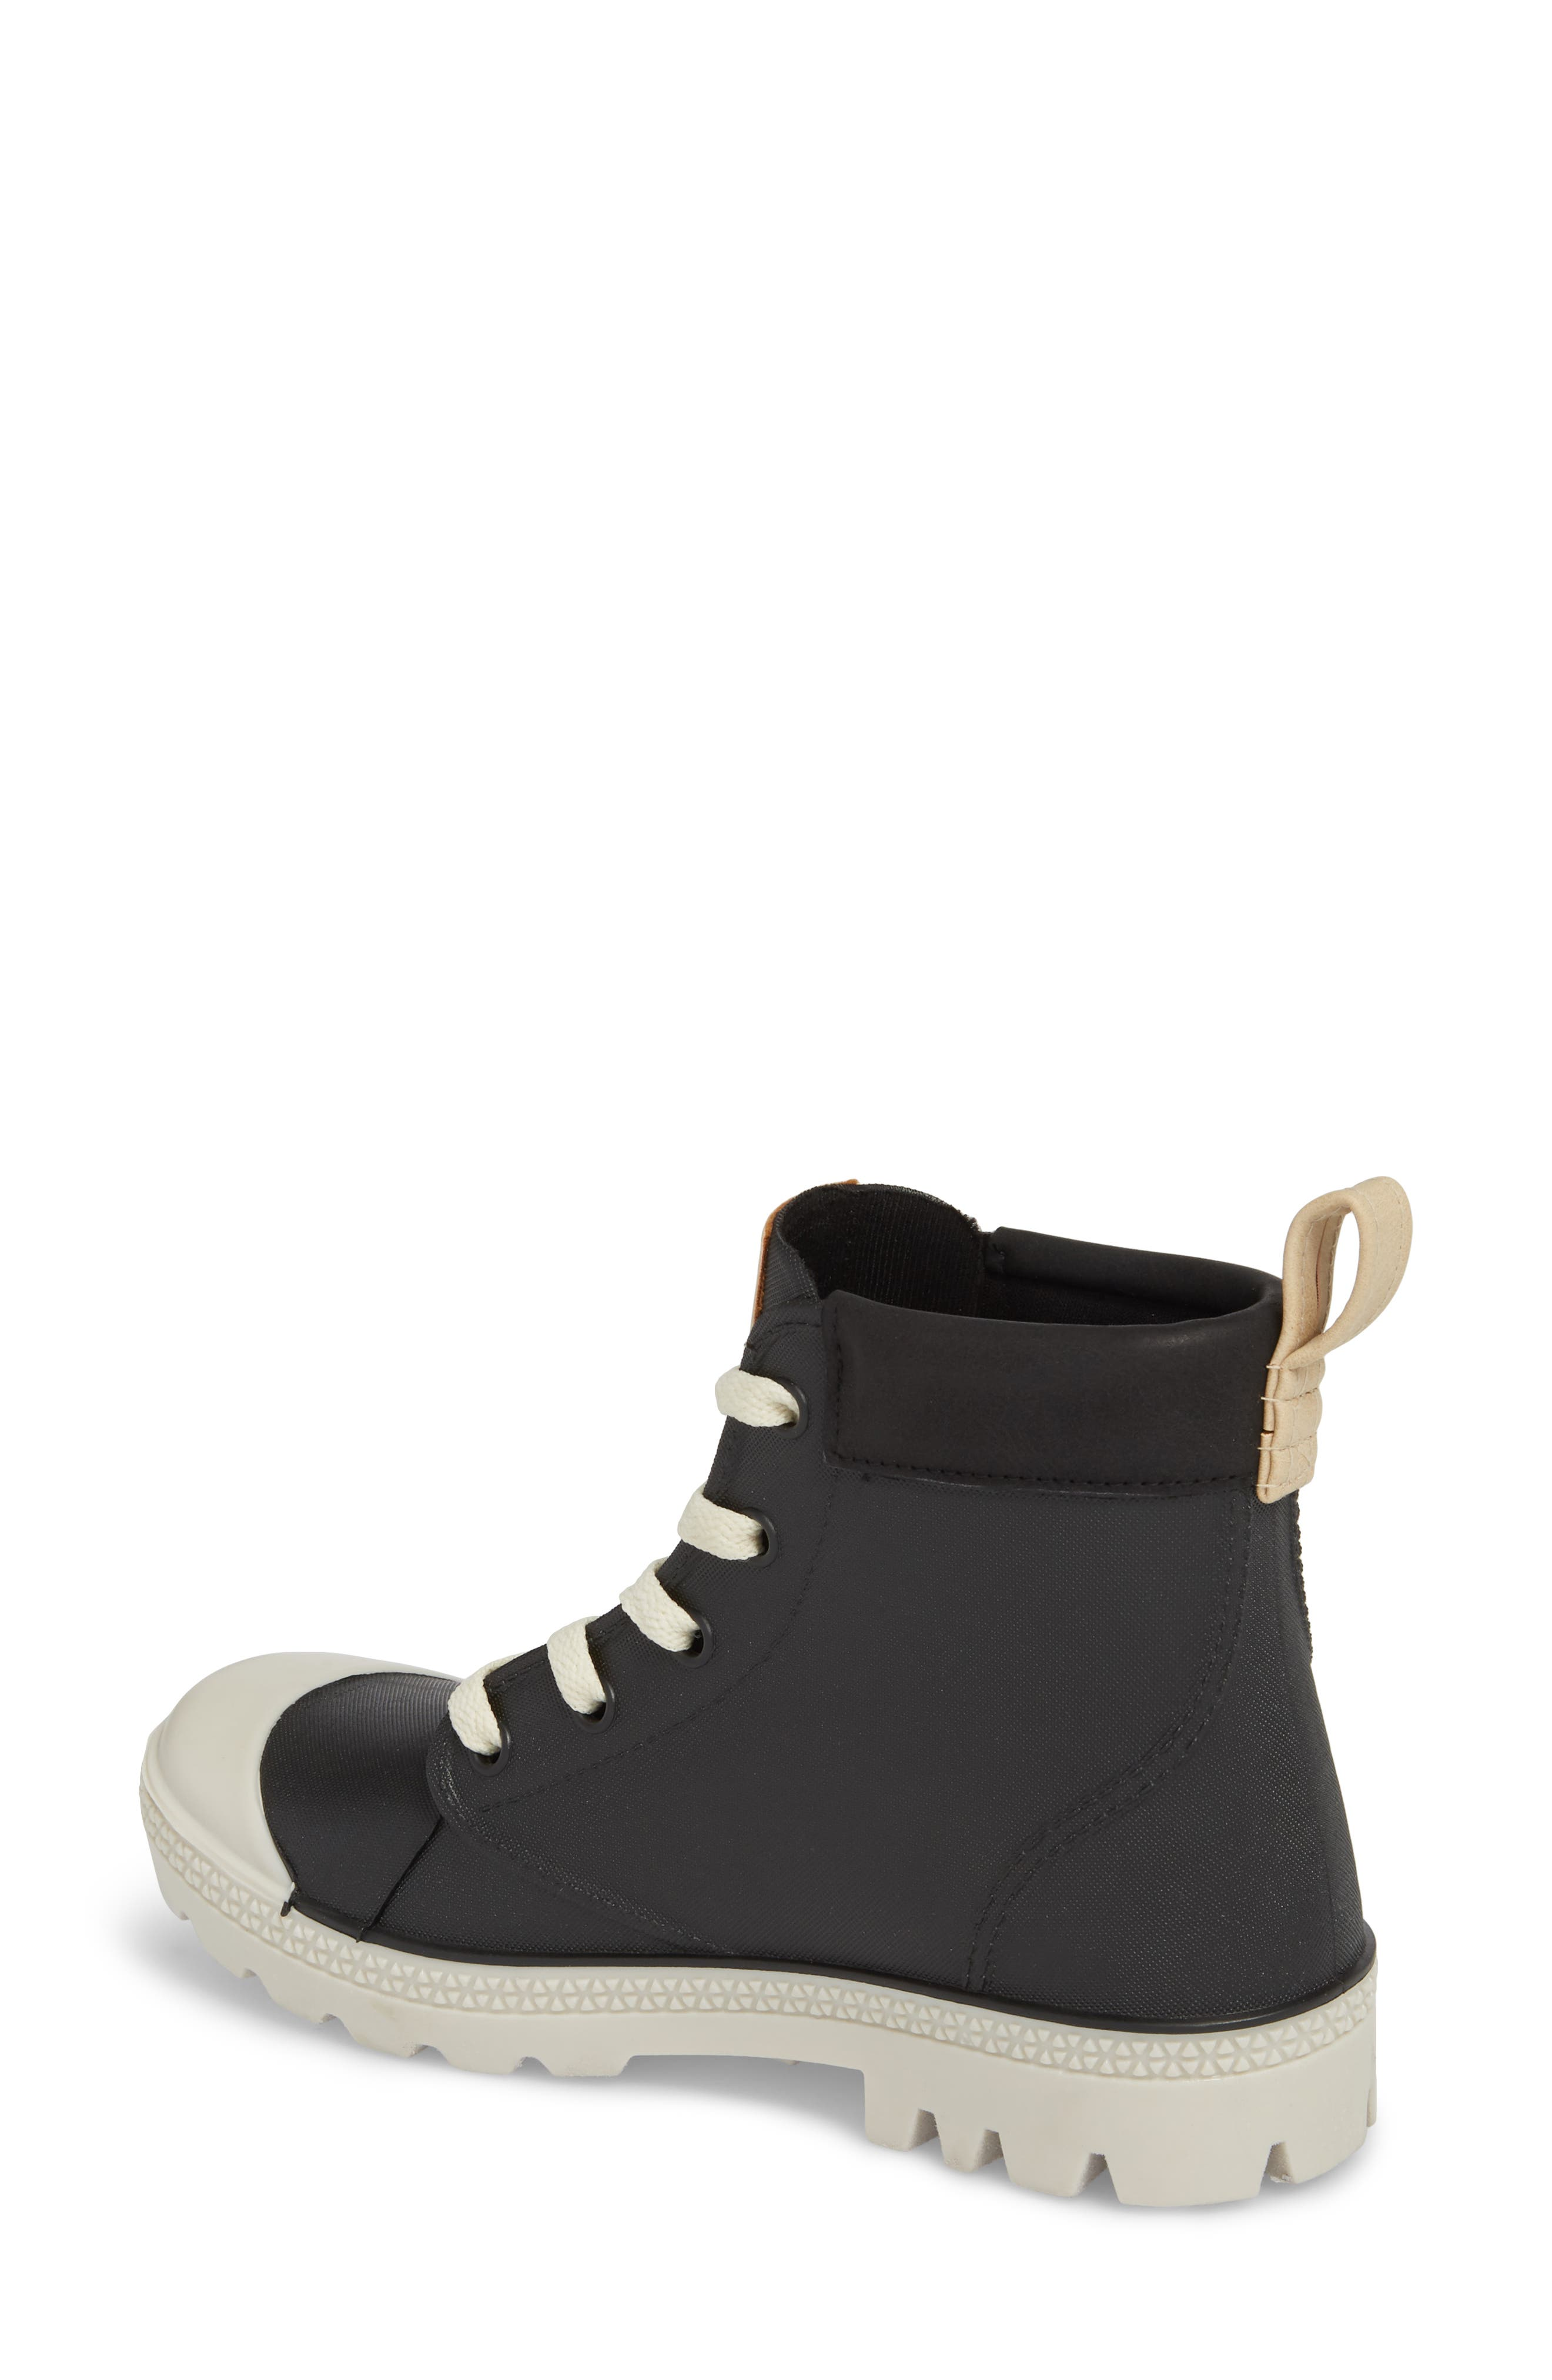 DÄV, Melrose Waterproof Sneaker Boot, Alternate thumbnail 2, color, 001